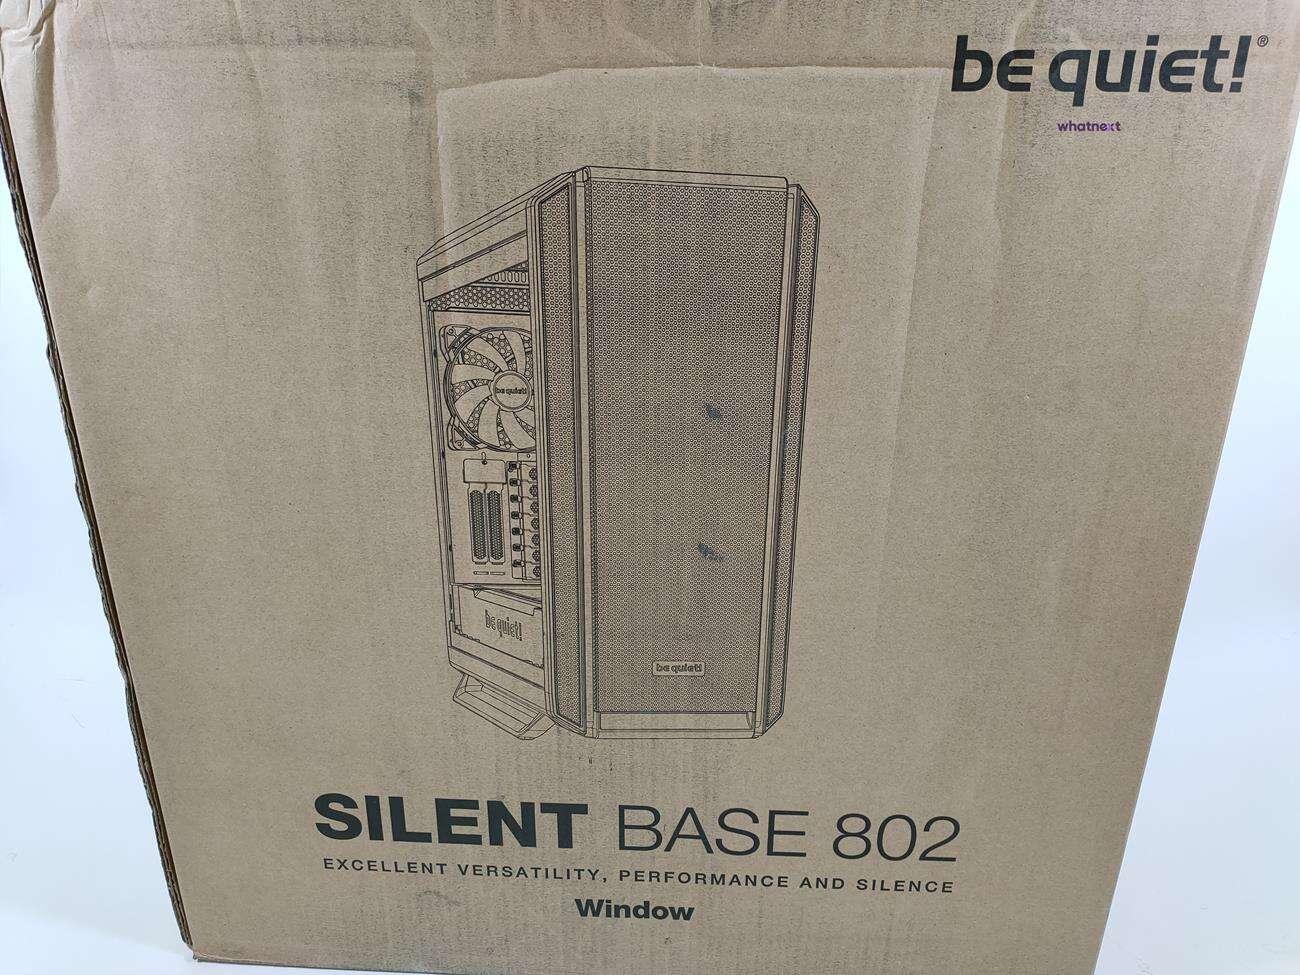 test be quiet! Silent Base 802 Window, recenzja be quiet! Silent Base 802 Window, opinia be quiet! Silent Base 802 Window